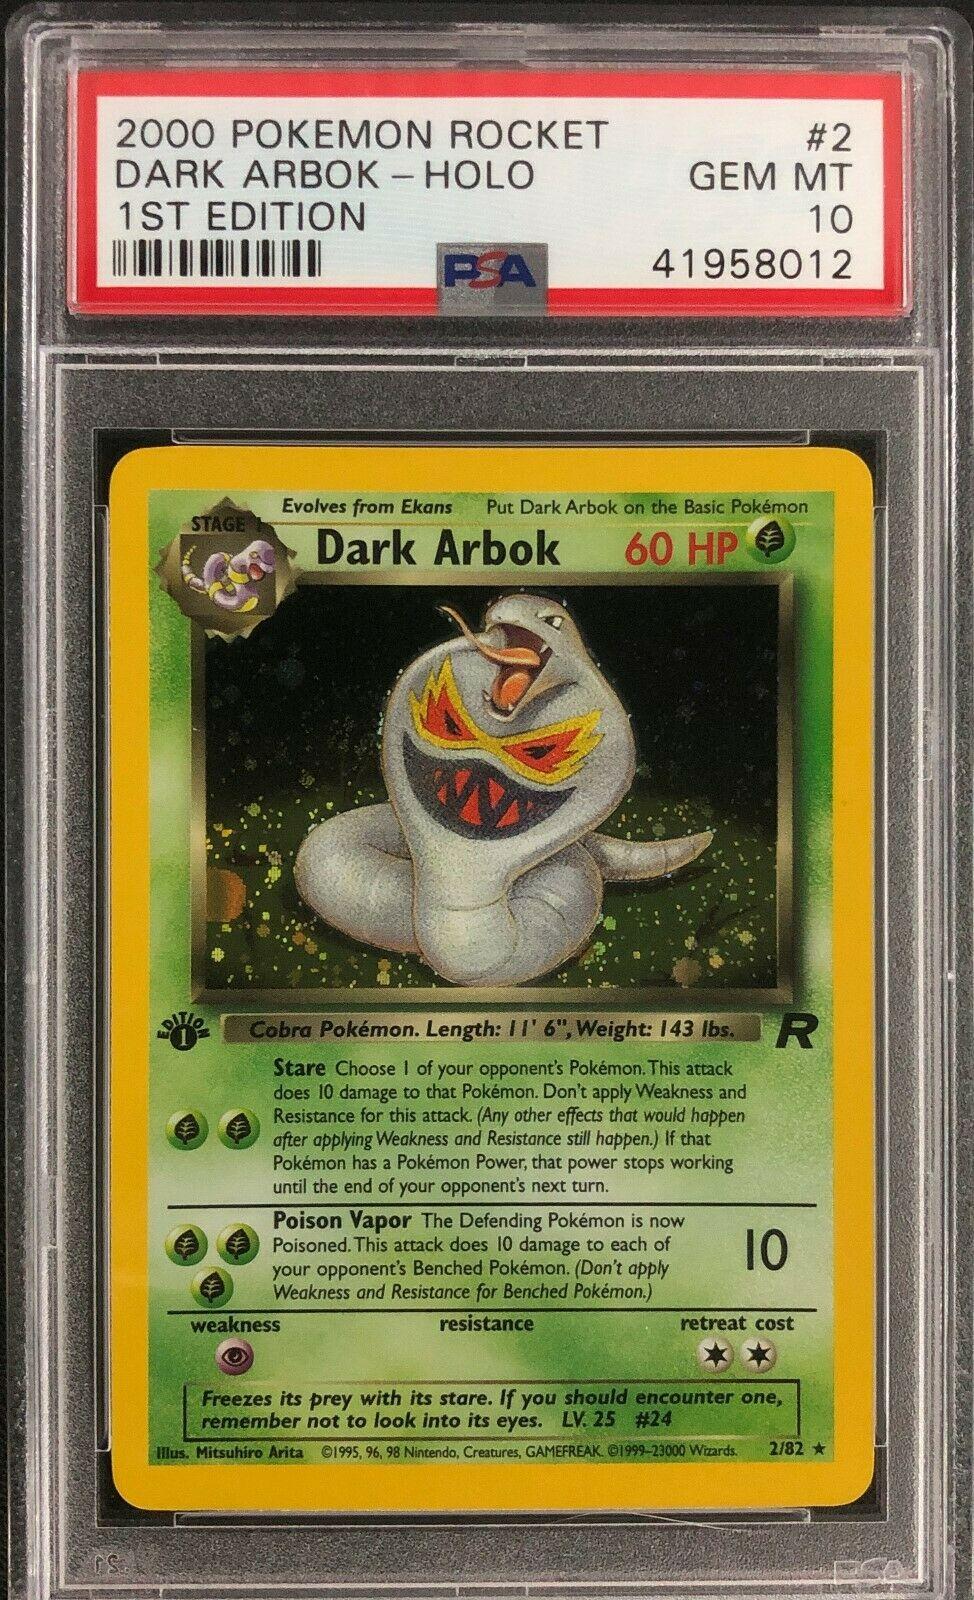 1st Edition Team Rocket Dark Arbok Holo Pokemon Card Mint PSA 10